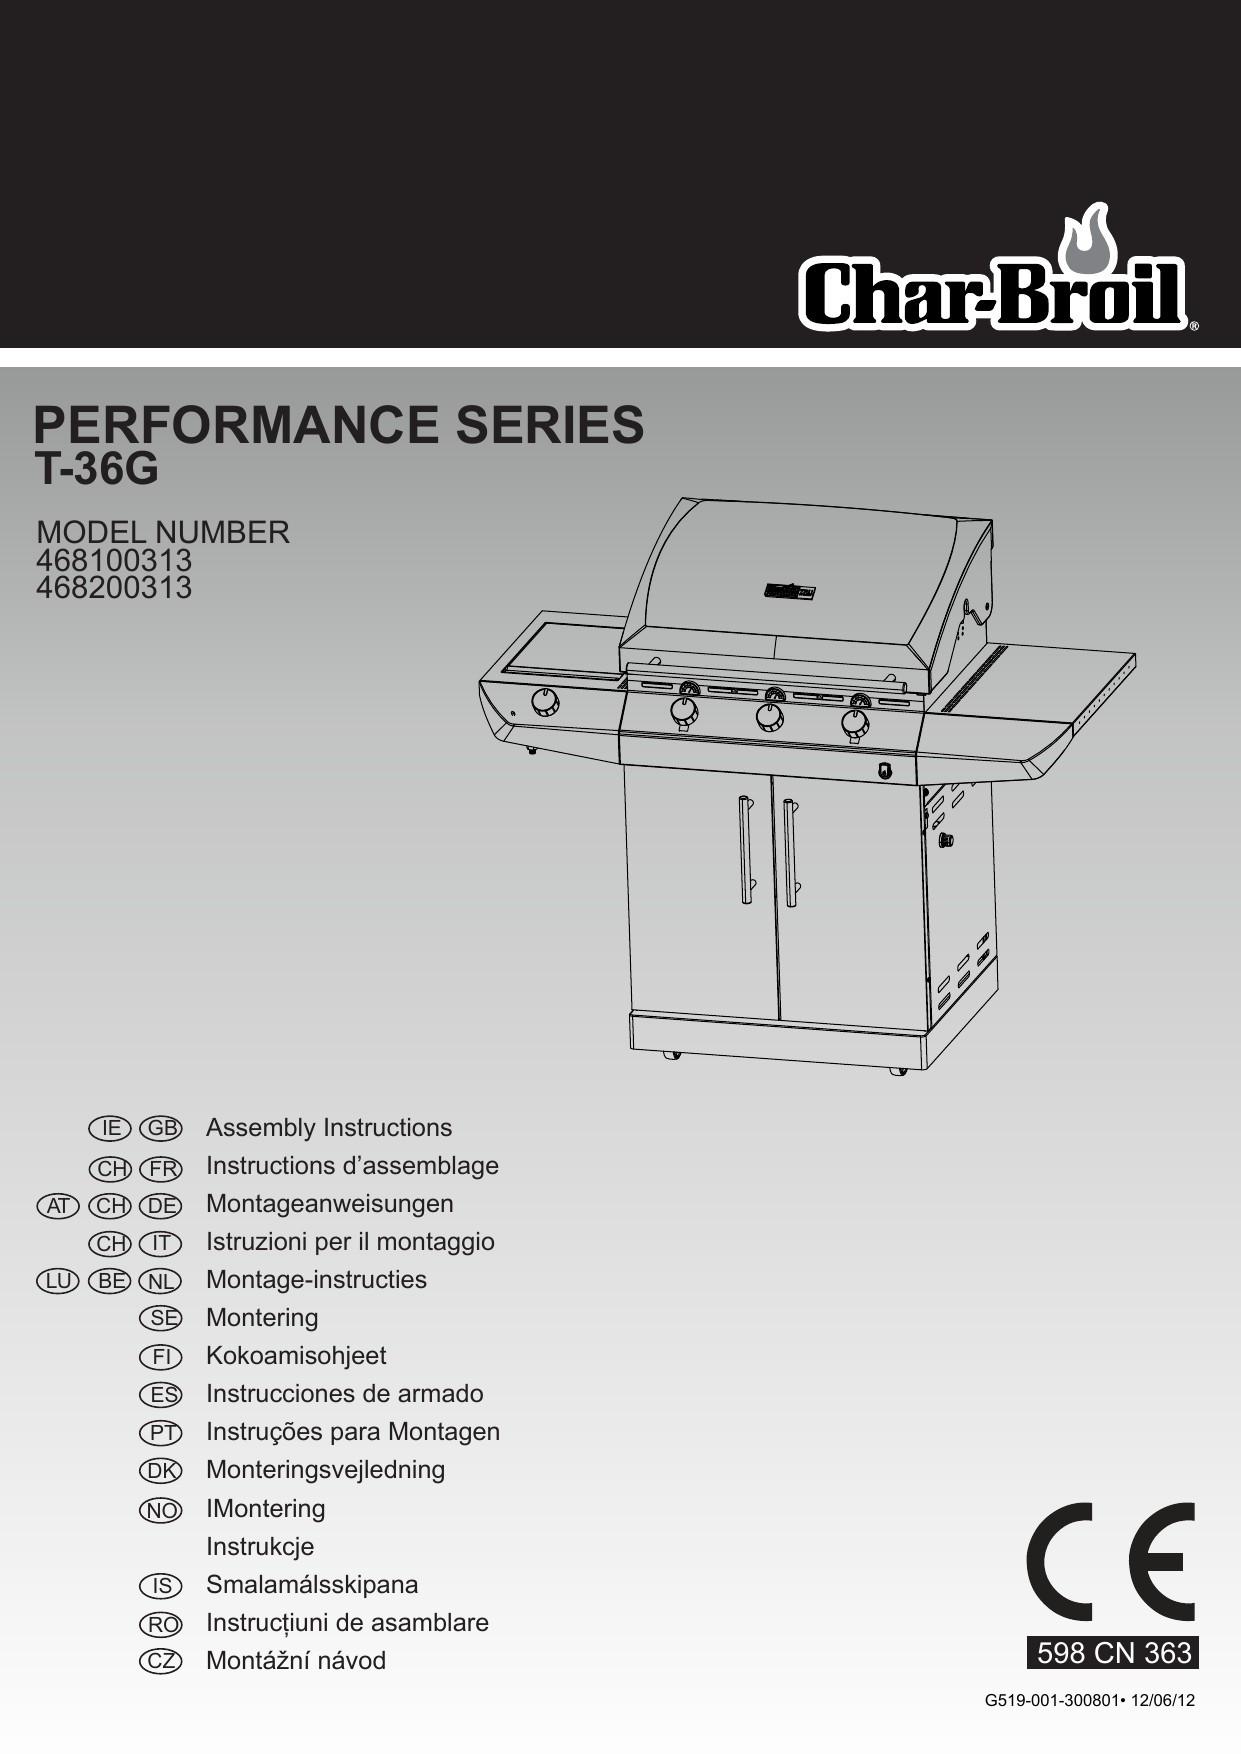 Charbroiler Pellet Grill Wiring Diagram Char Broil Parts Diagram Of Charbroiler Pellet Grill Wiring Diagram